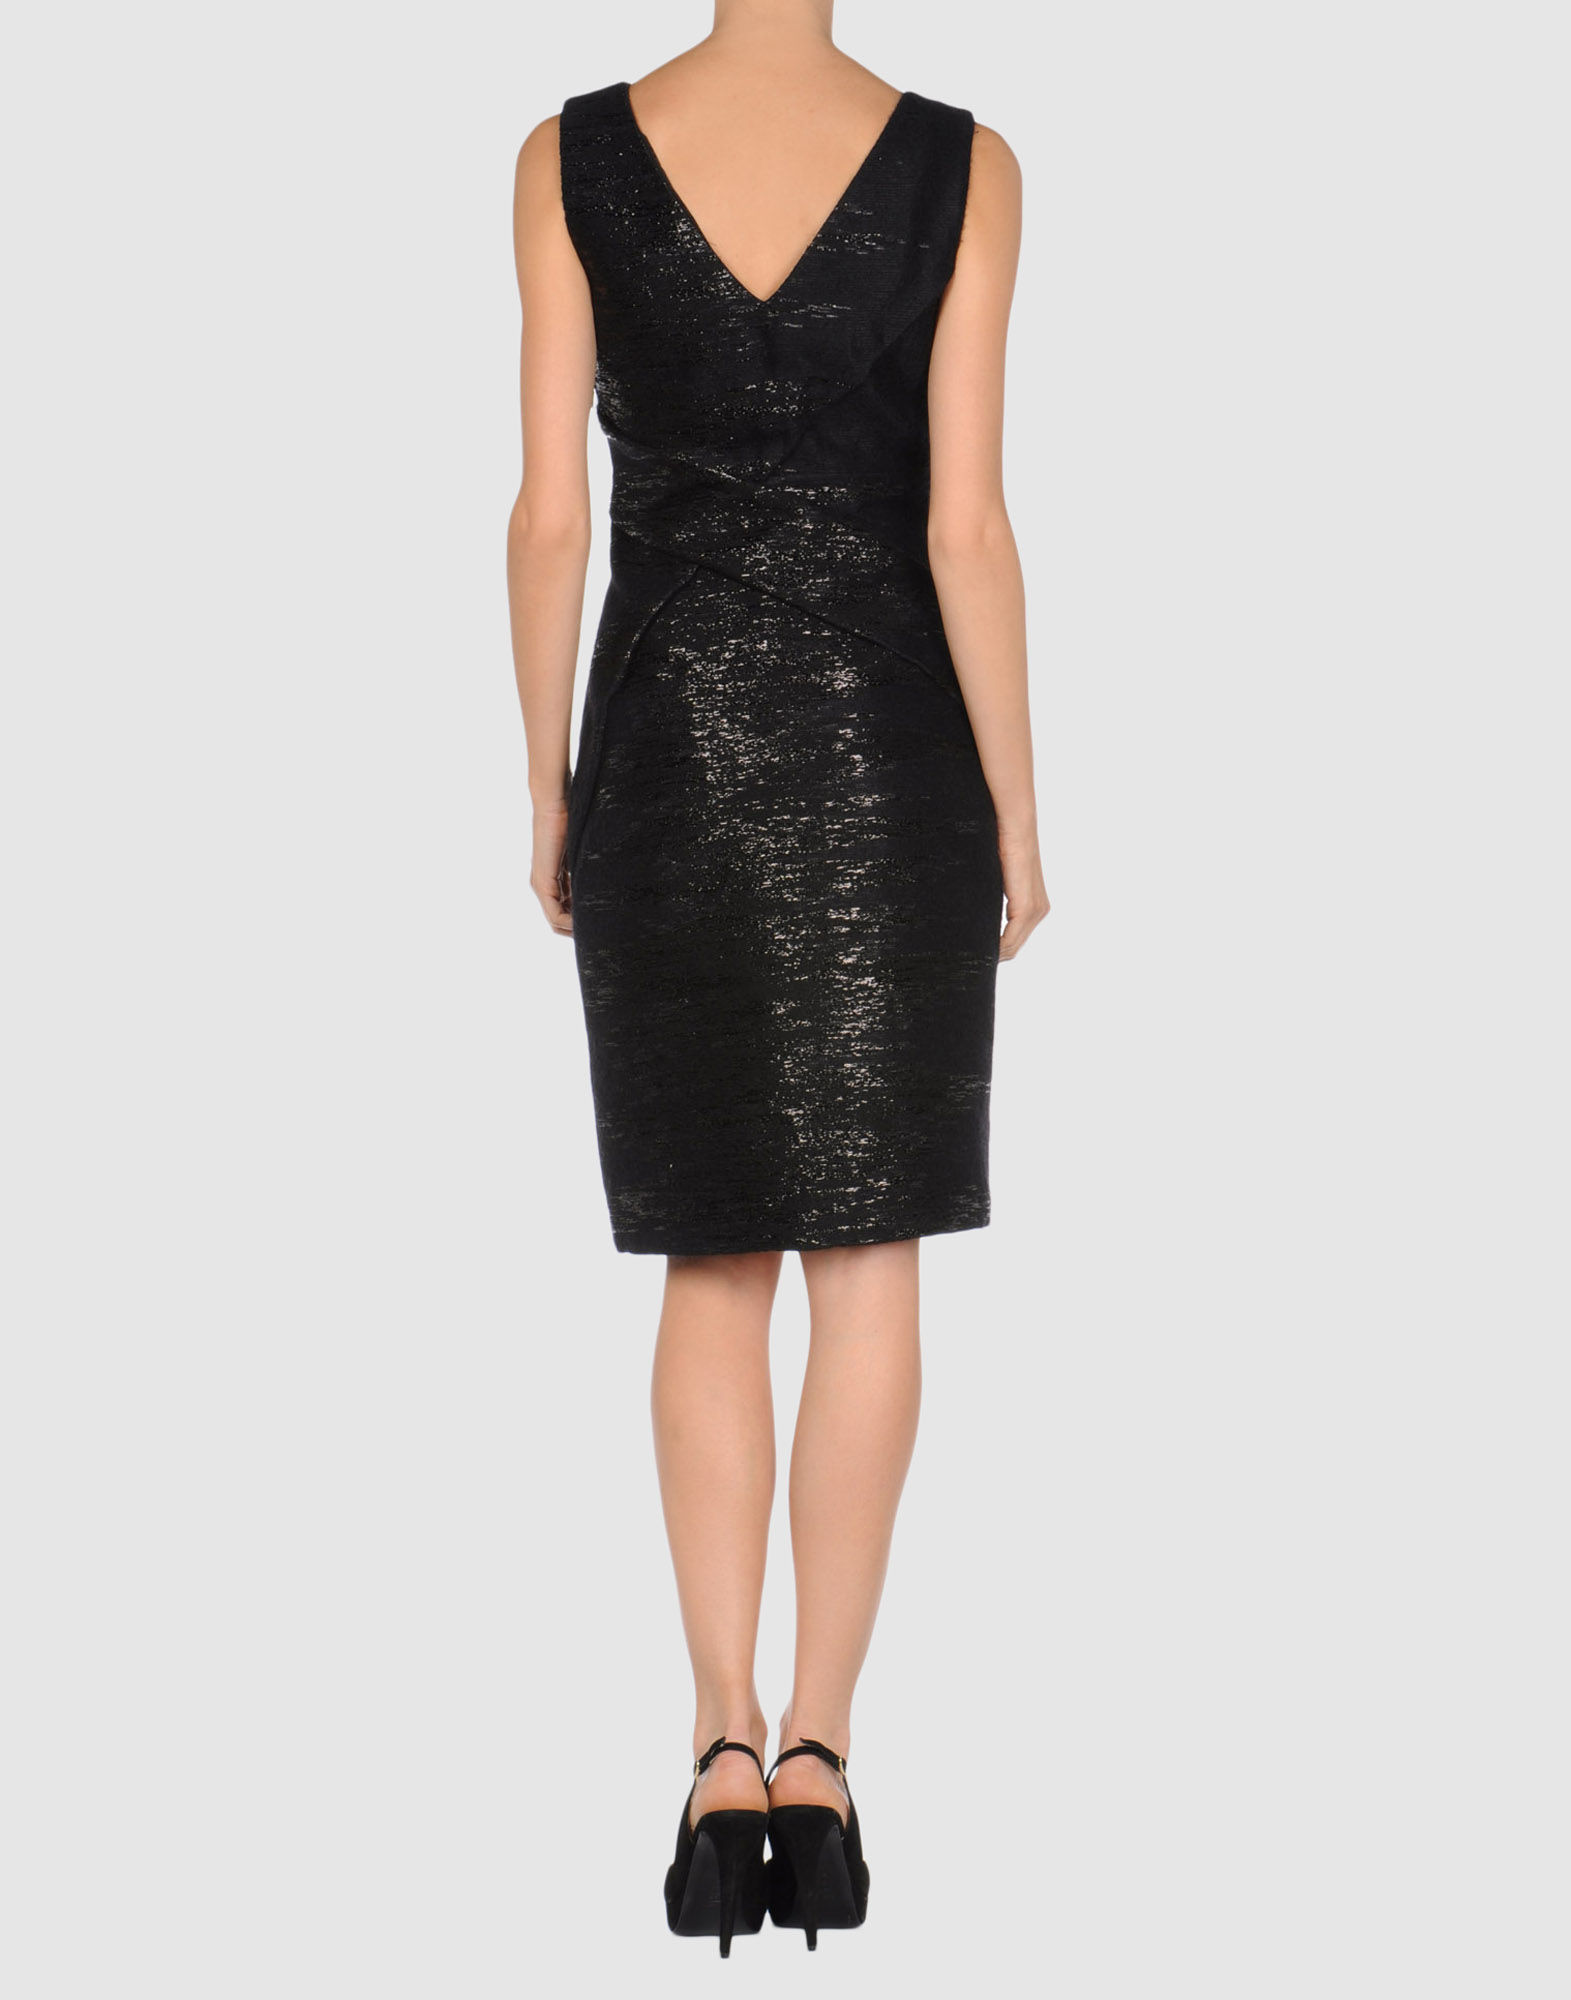 34225003TJ 14 r - Evening Φορεματα Versace 2011 2012 Κωδ.09